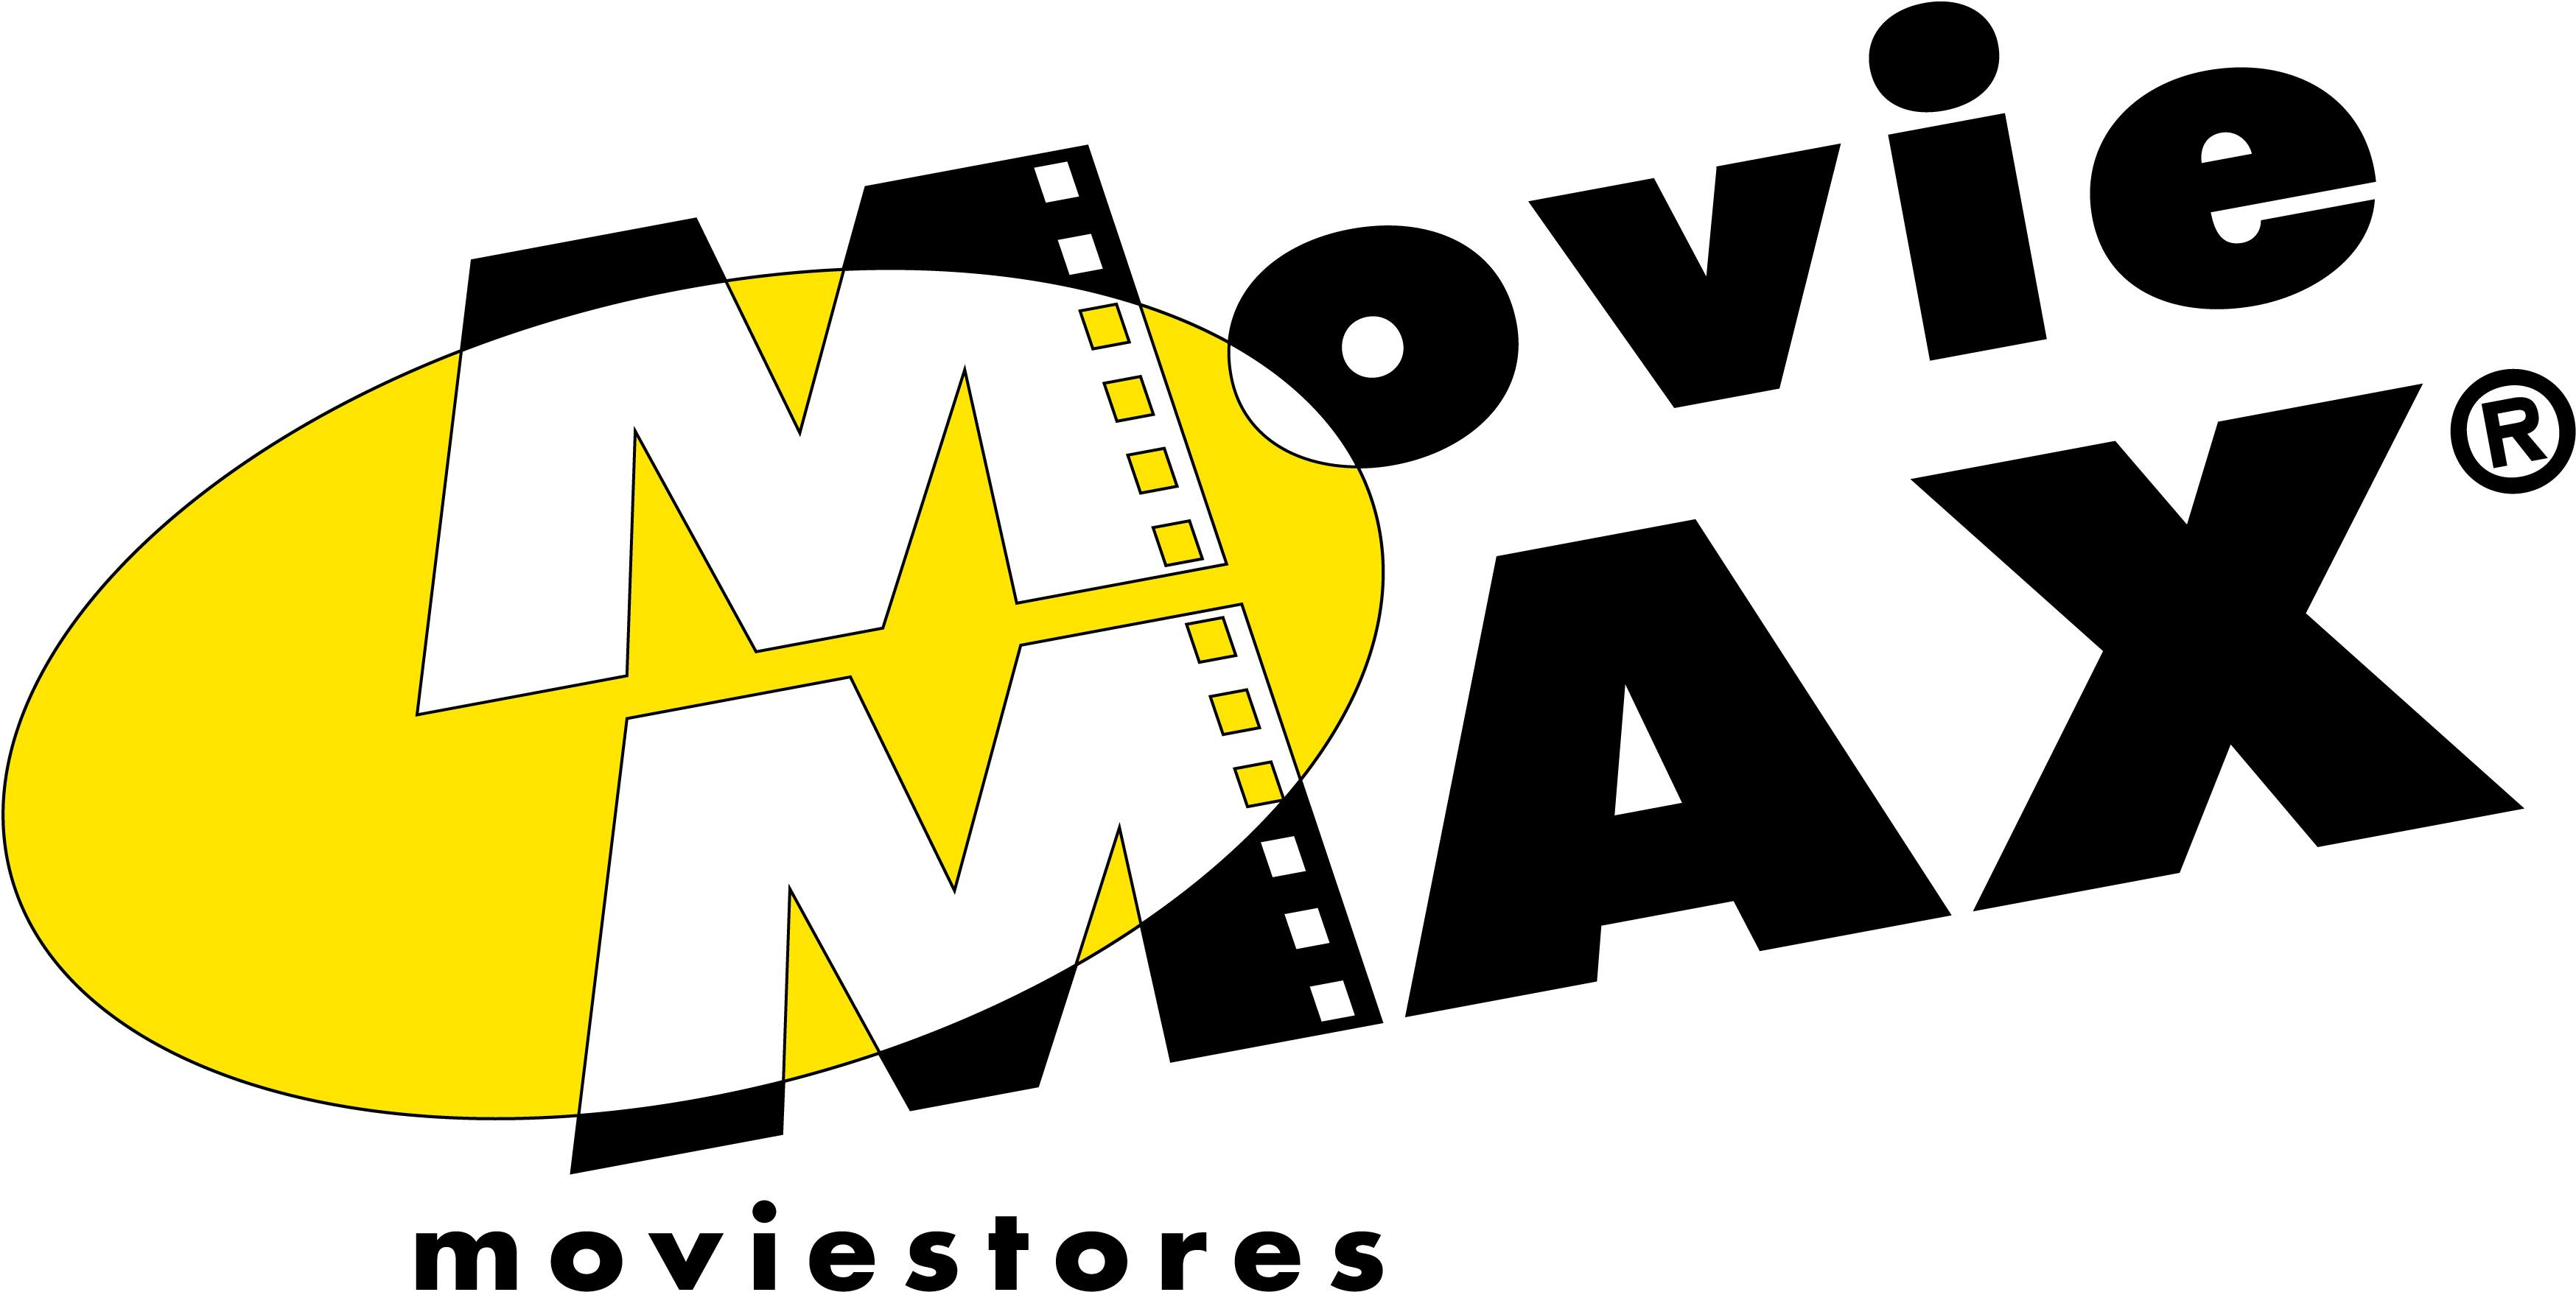 logo movie max high res jpg cmyk